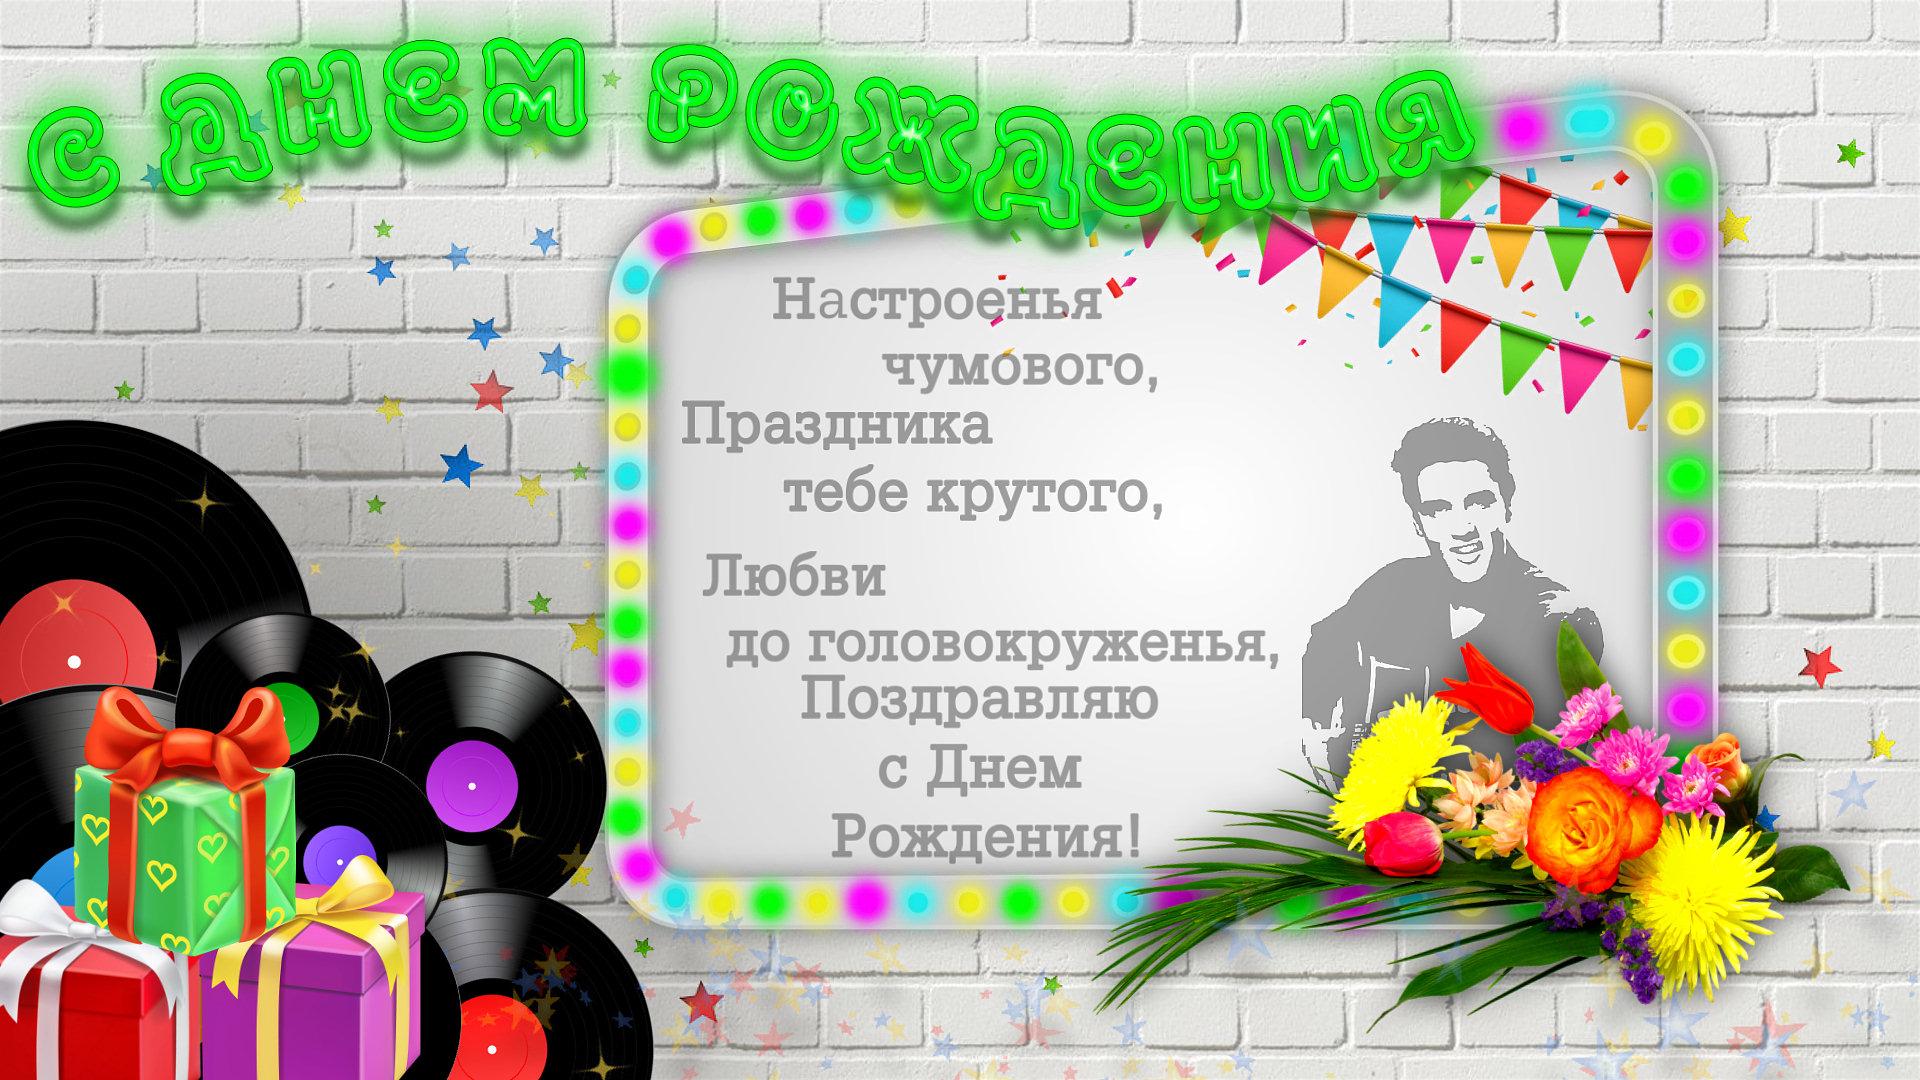 Birthday, congratulation, wish, gift, girl, woman, anniversary, holiday, День рождения, поздравление, пожелание, женский, мужской, праздник, рок-н-ролл, rock'n'roll,